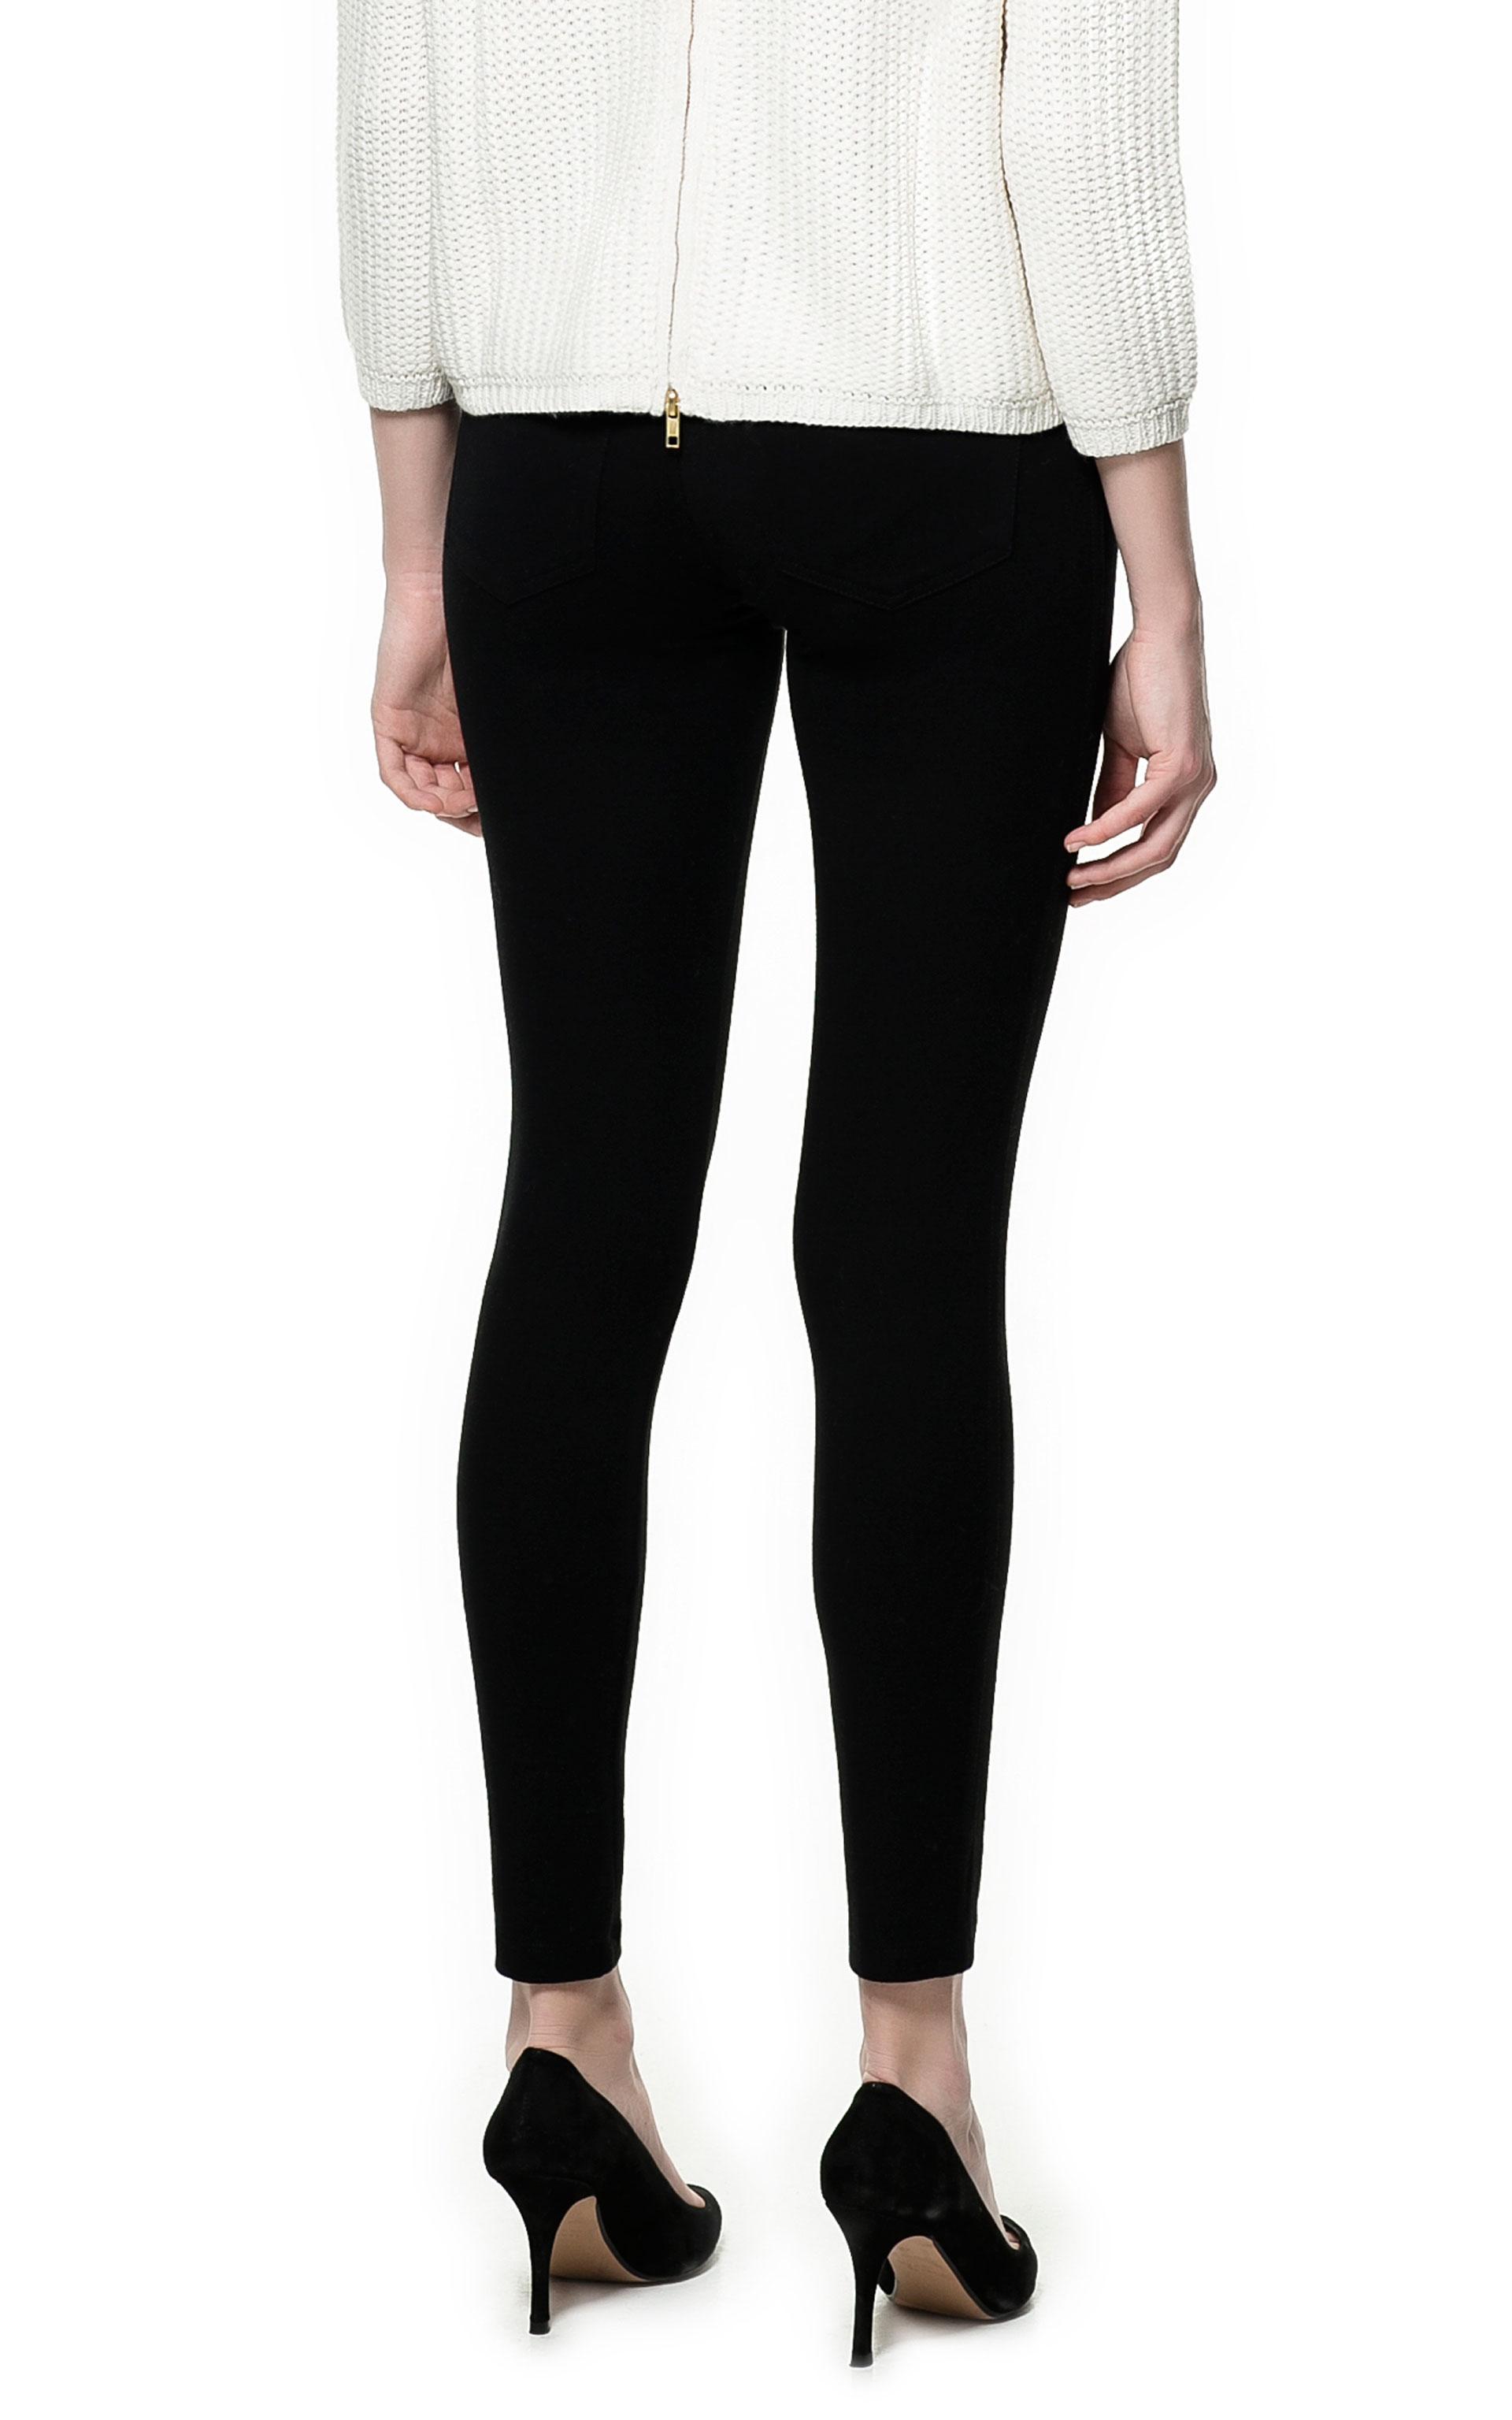 Elegant Women39s Faux Leather Pants Women39s Black Leather Pants